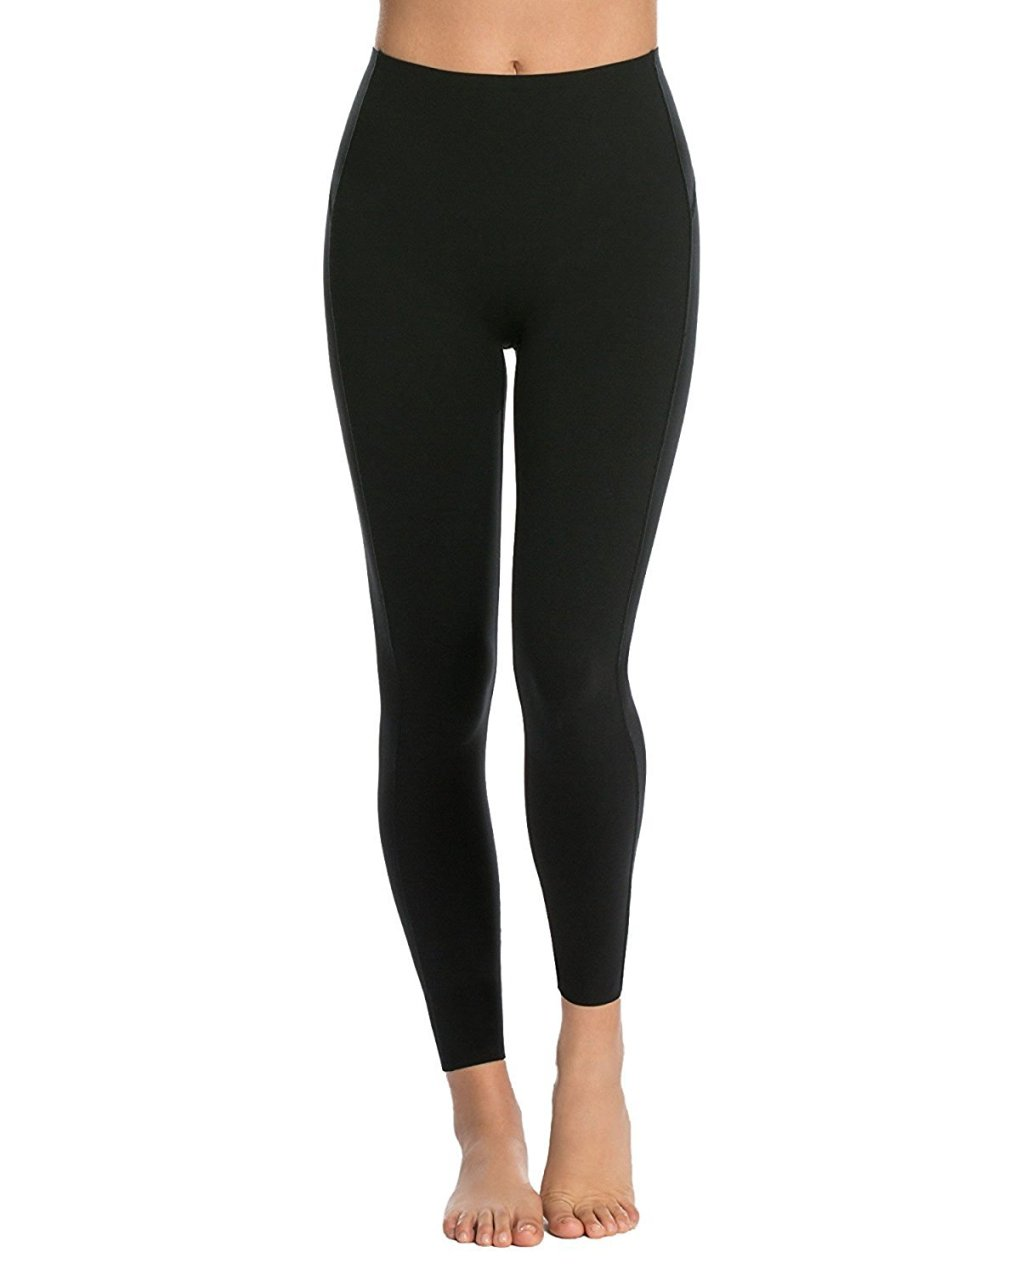 Spanx Every Wear Icon Black Leggings, Very Black